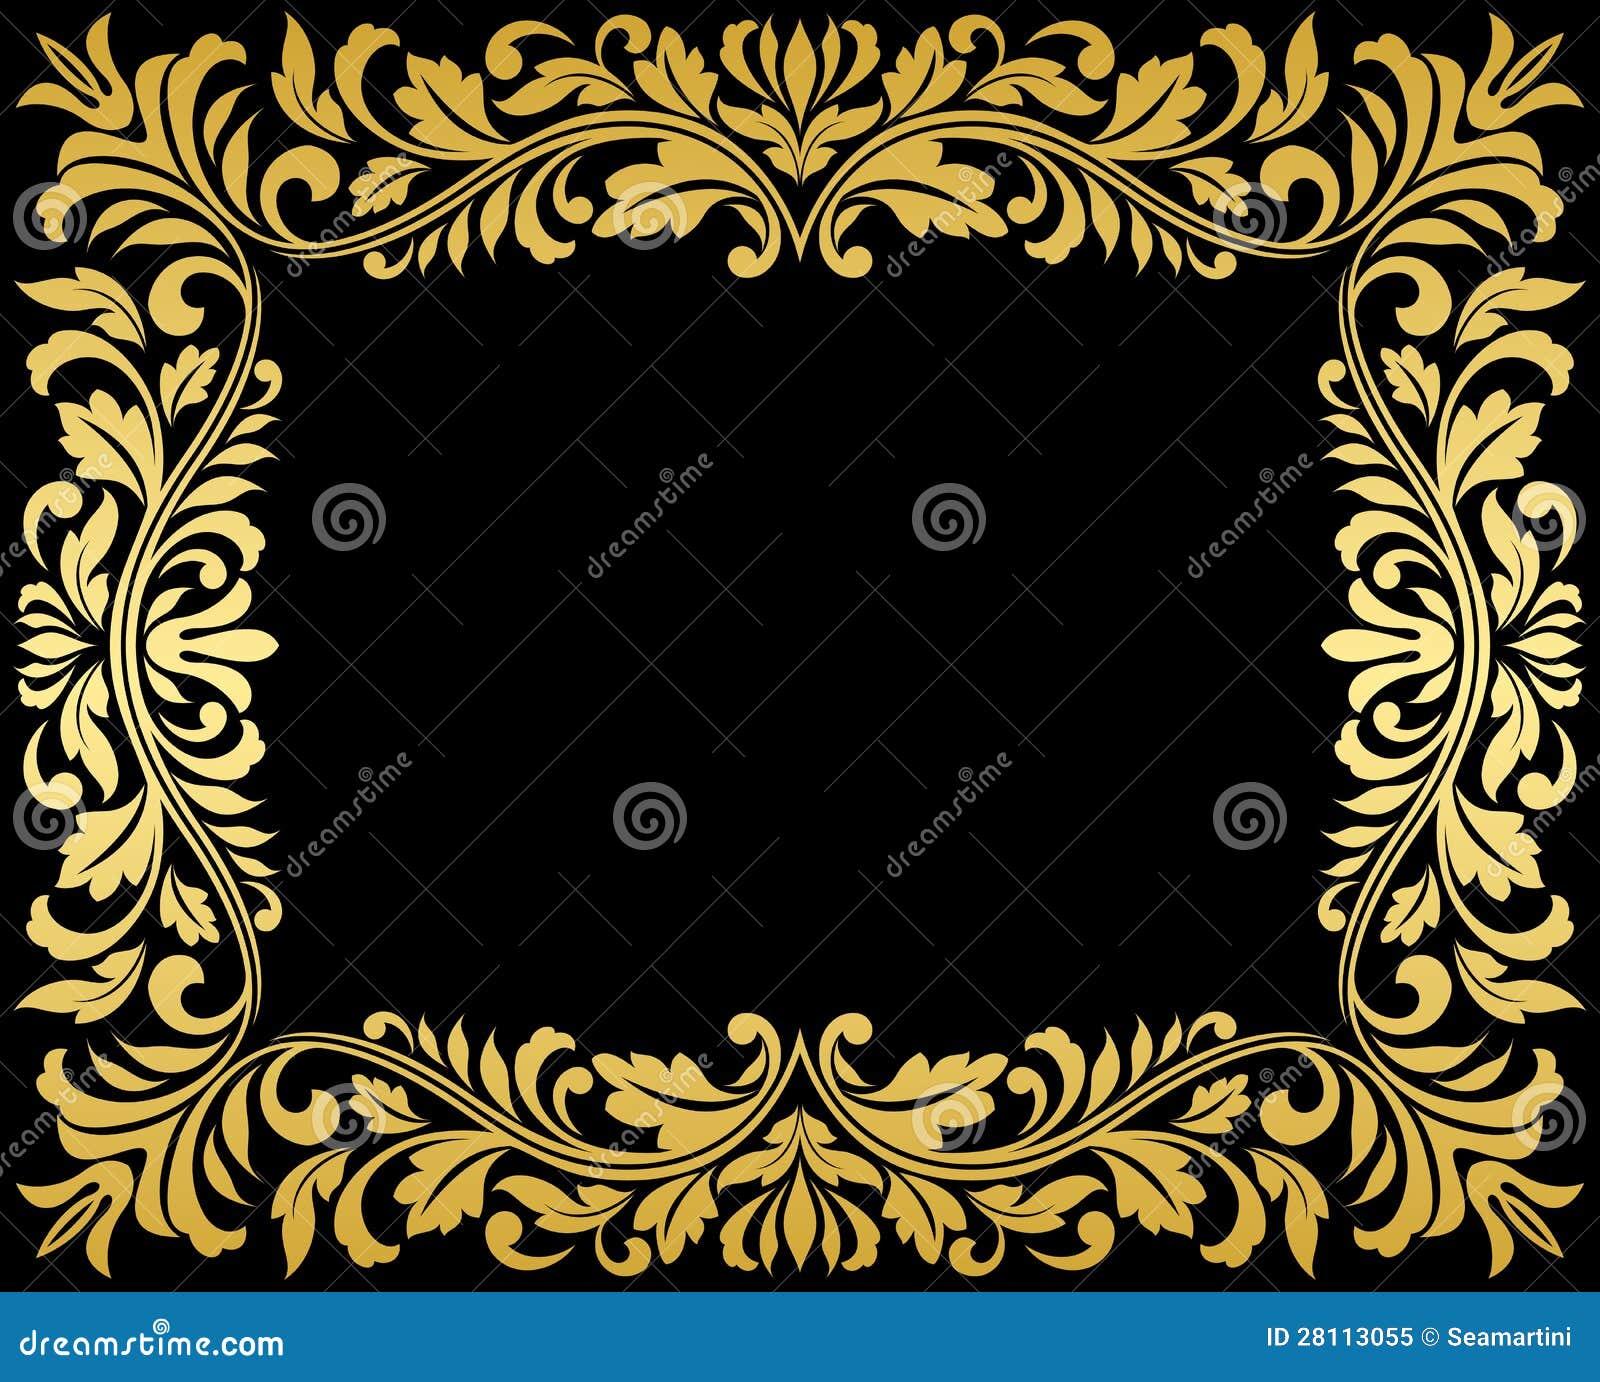 Рамка золота год сбора винограда с флористическим